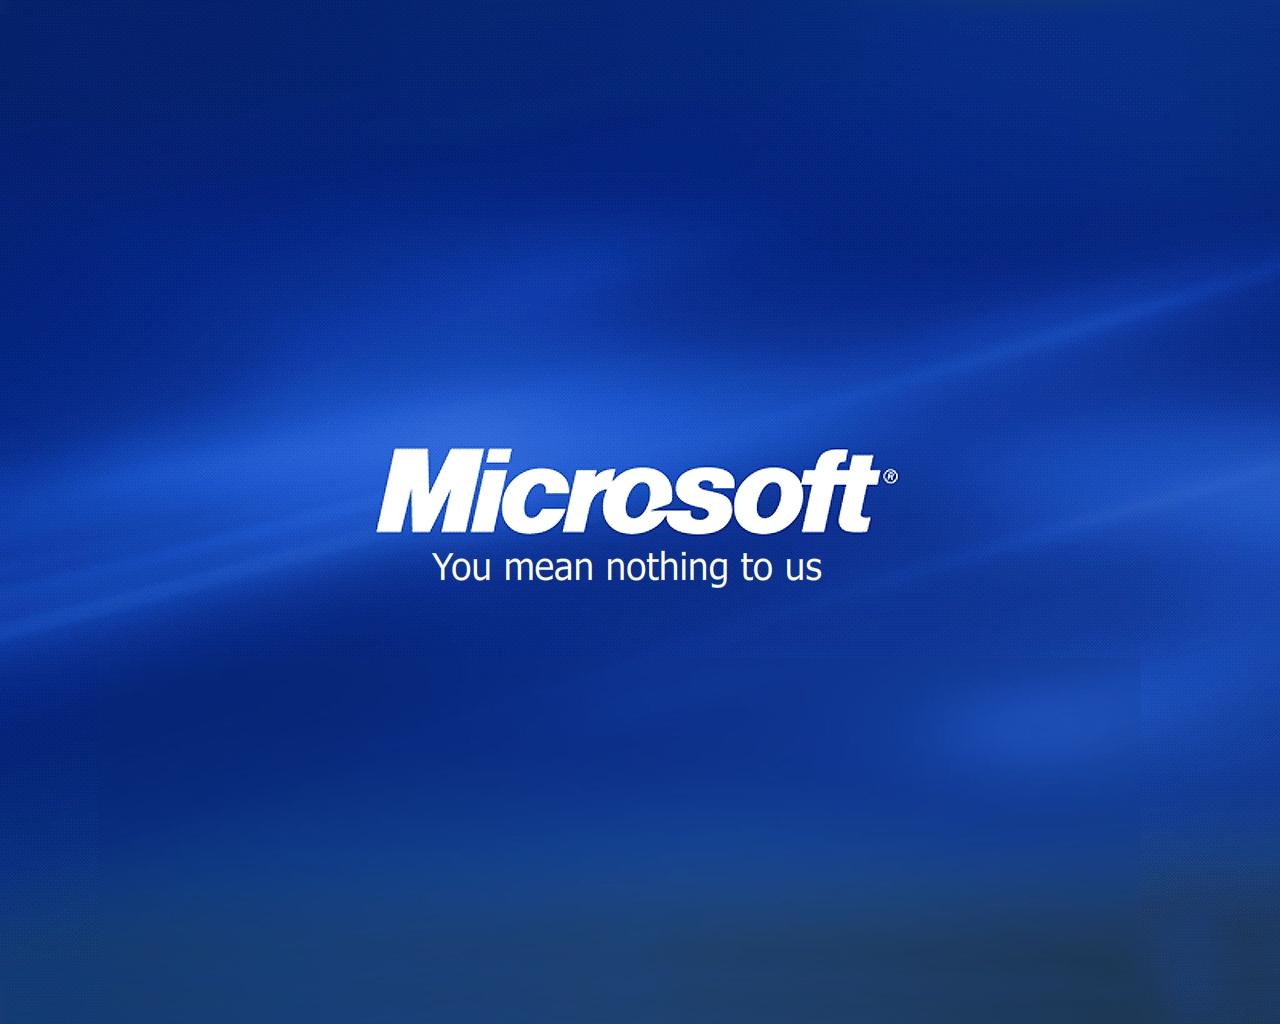 Microsoft Desktop Wallpaper Pictures 1280x1024